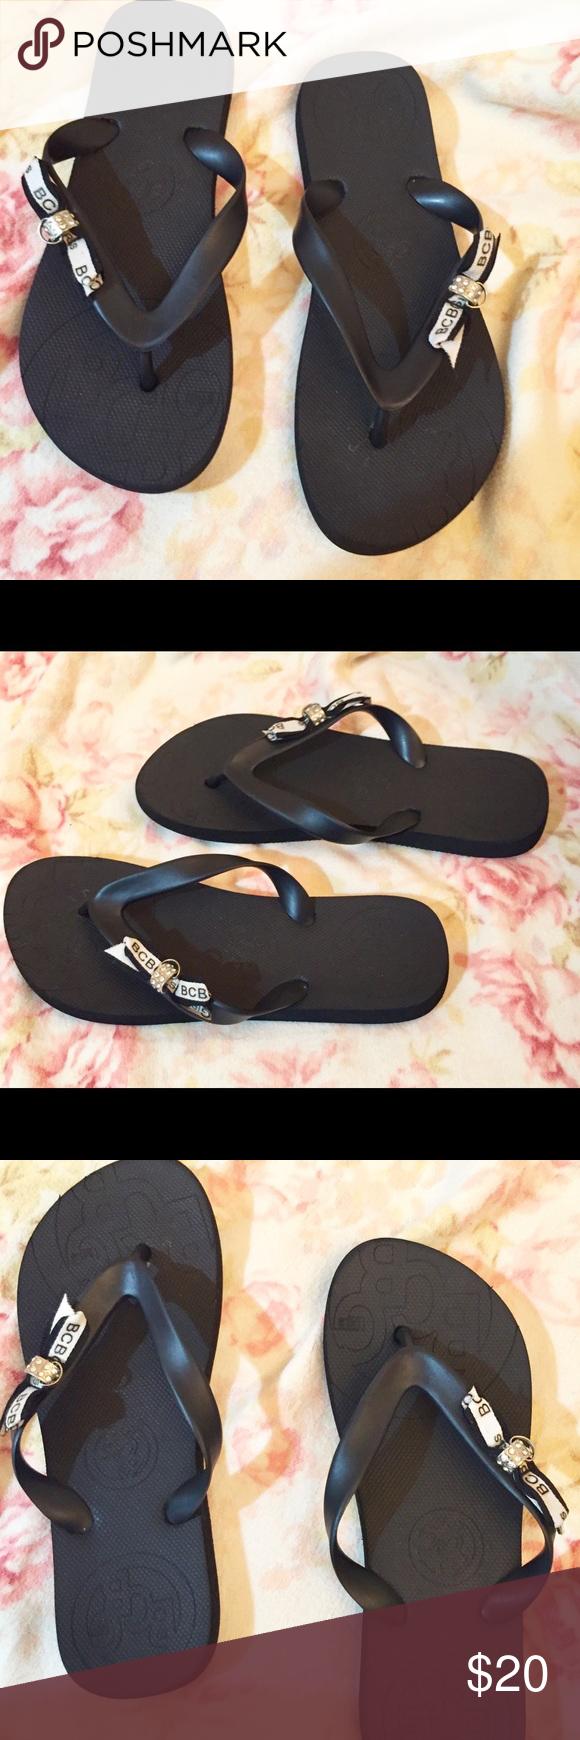 0ddc95ddfd8496 ❤️NWOT. SUPER CUTE BCBG Flip Flops Size 7 Black Flip Flops with Ribbons    Crystals. BRAND NEW! NEVER WORN! BCBG Shoes Sandals